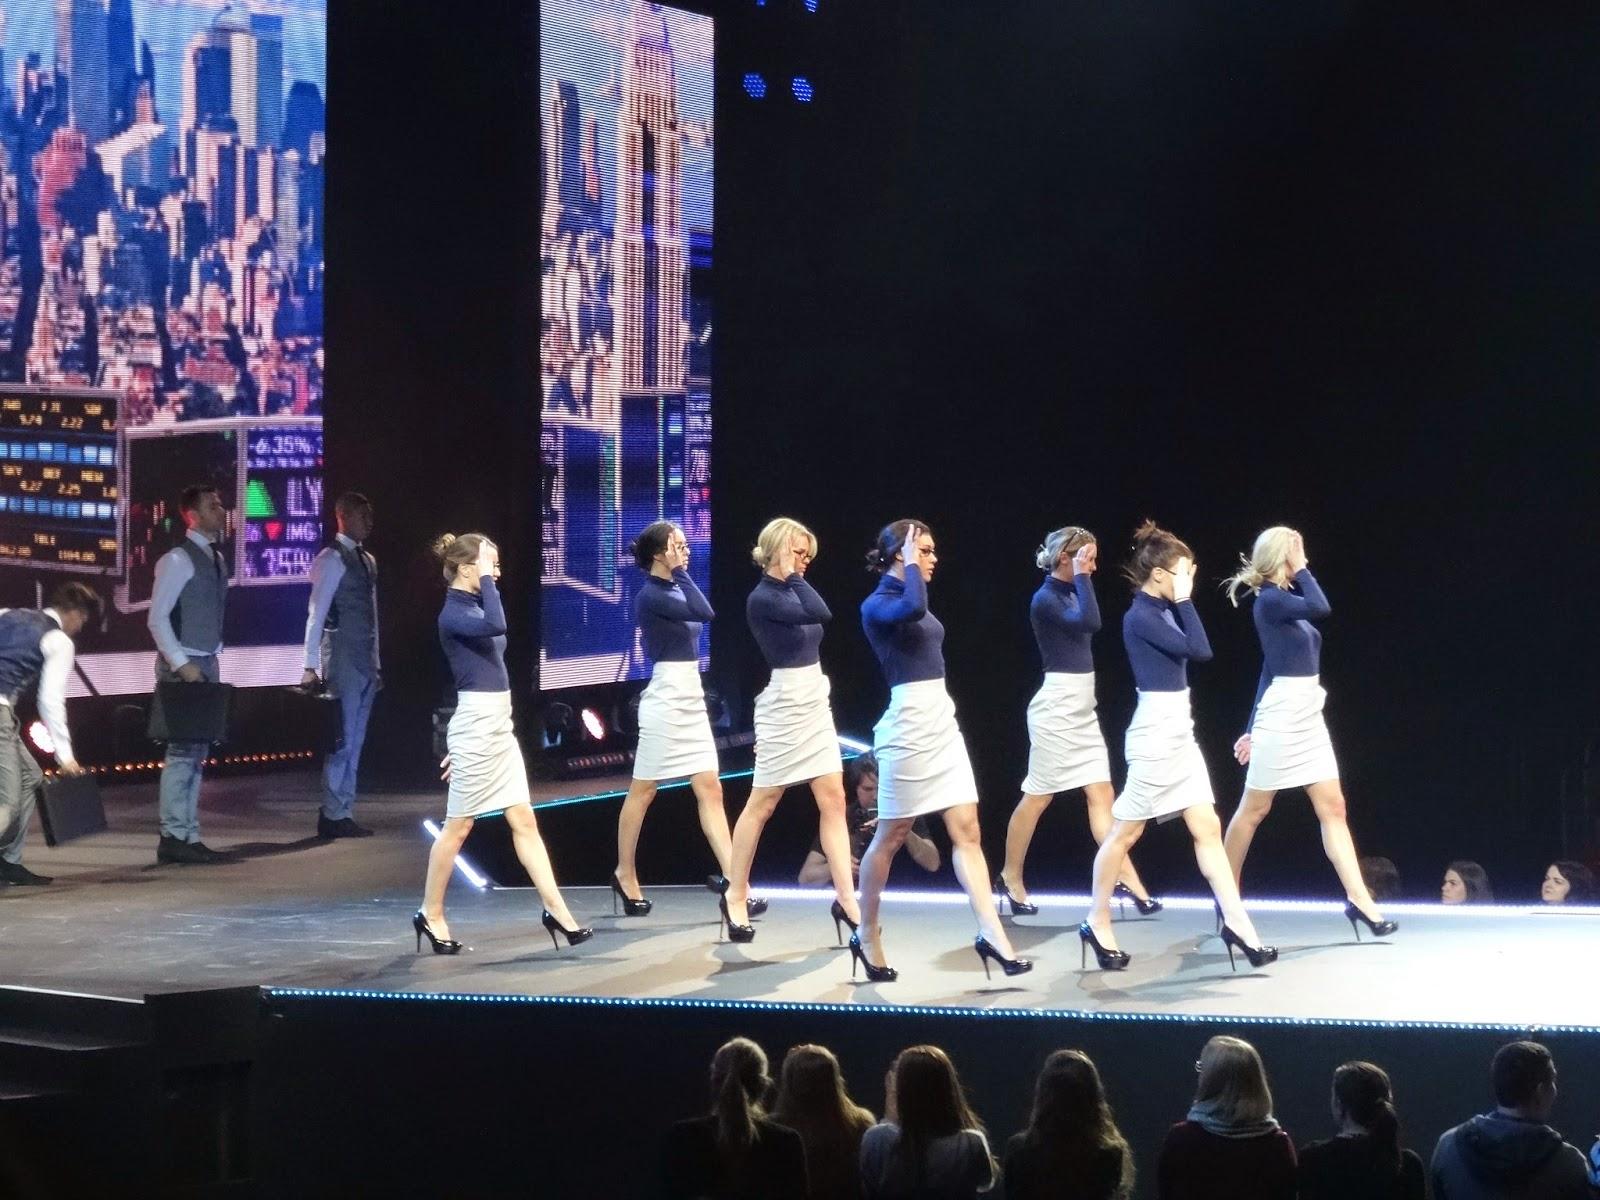 The Clothes Show in Birmingham Fashion Theatre